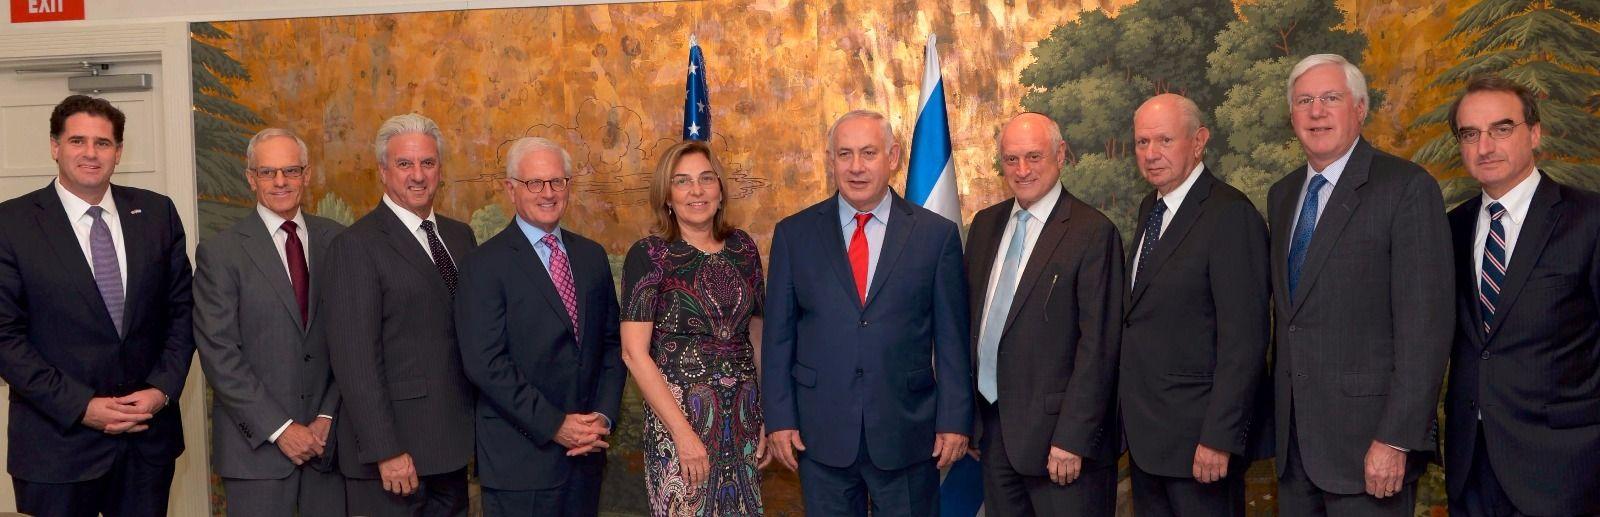 Israeli prime minister Benjamin Netanyahu meeting with Jewish leaders in New York, September 17, 2017